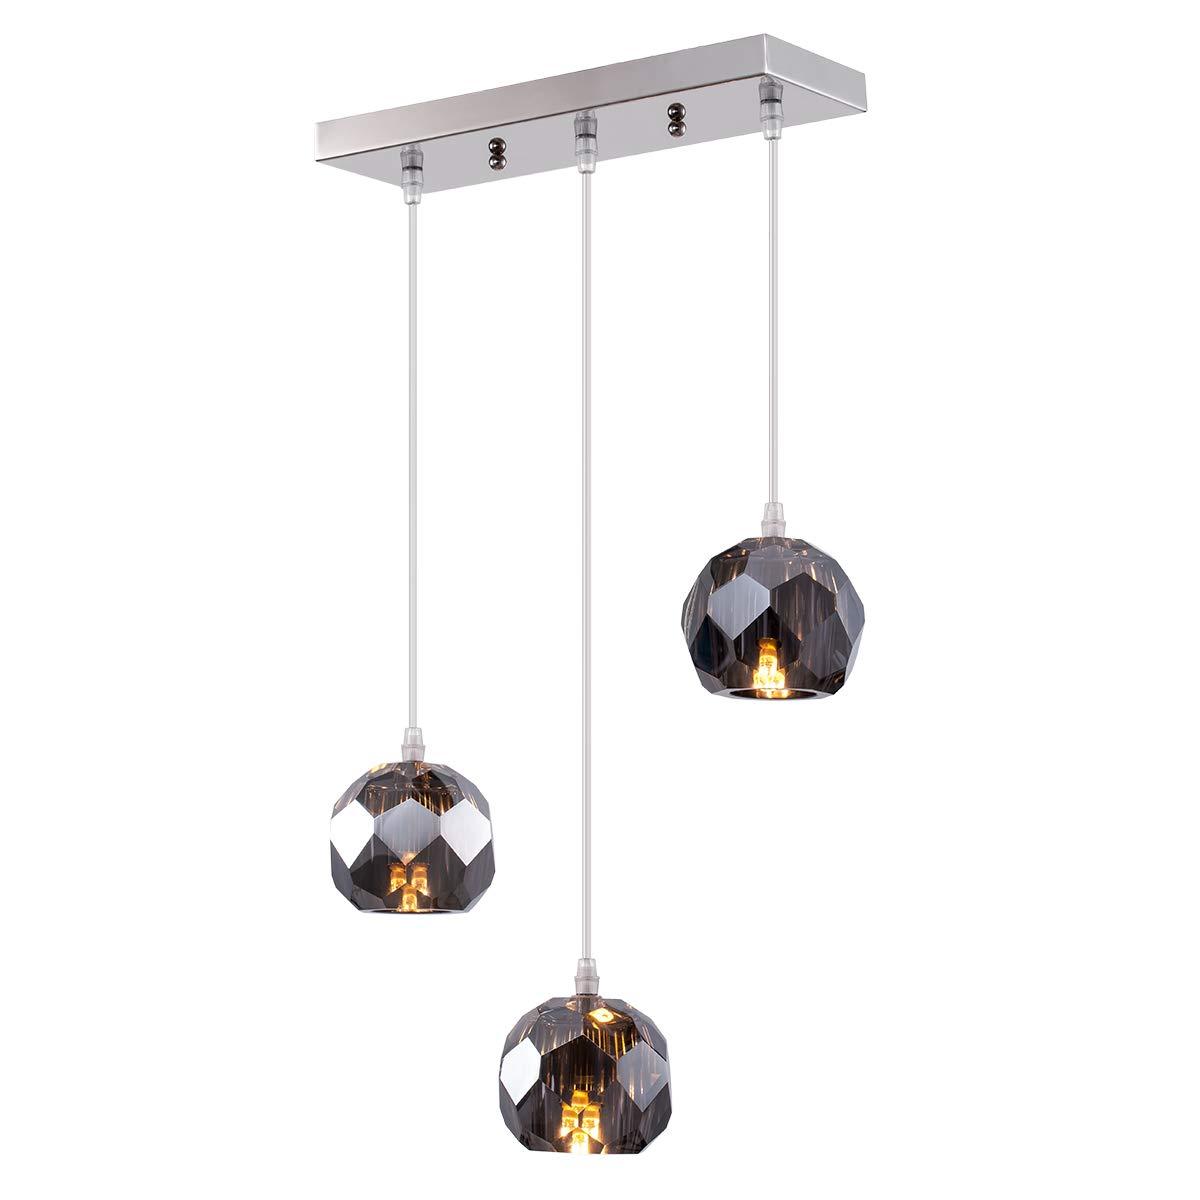 Fancy crystal globe pendant lighting nickel plating indoor decorative ceiling pendant light fixture for above dinning table kitchen island living room bar